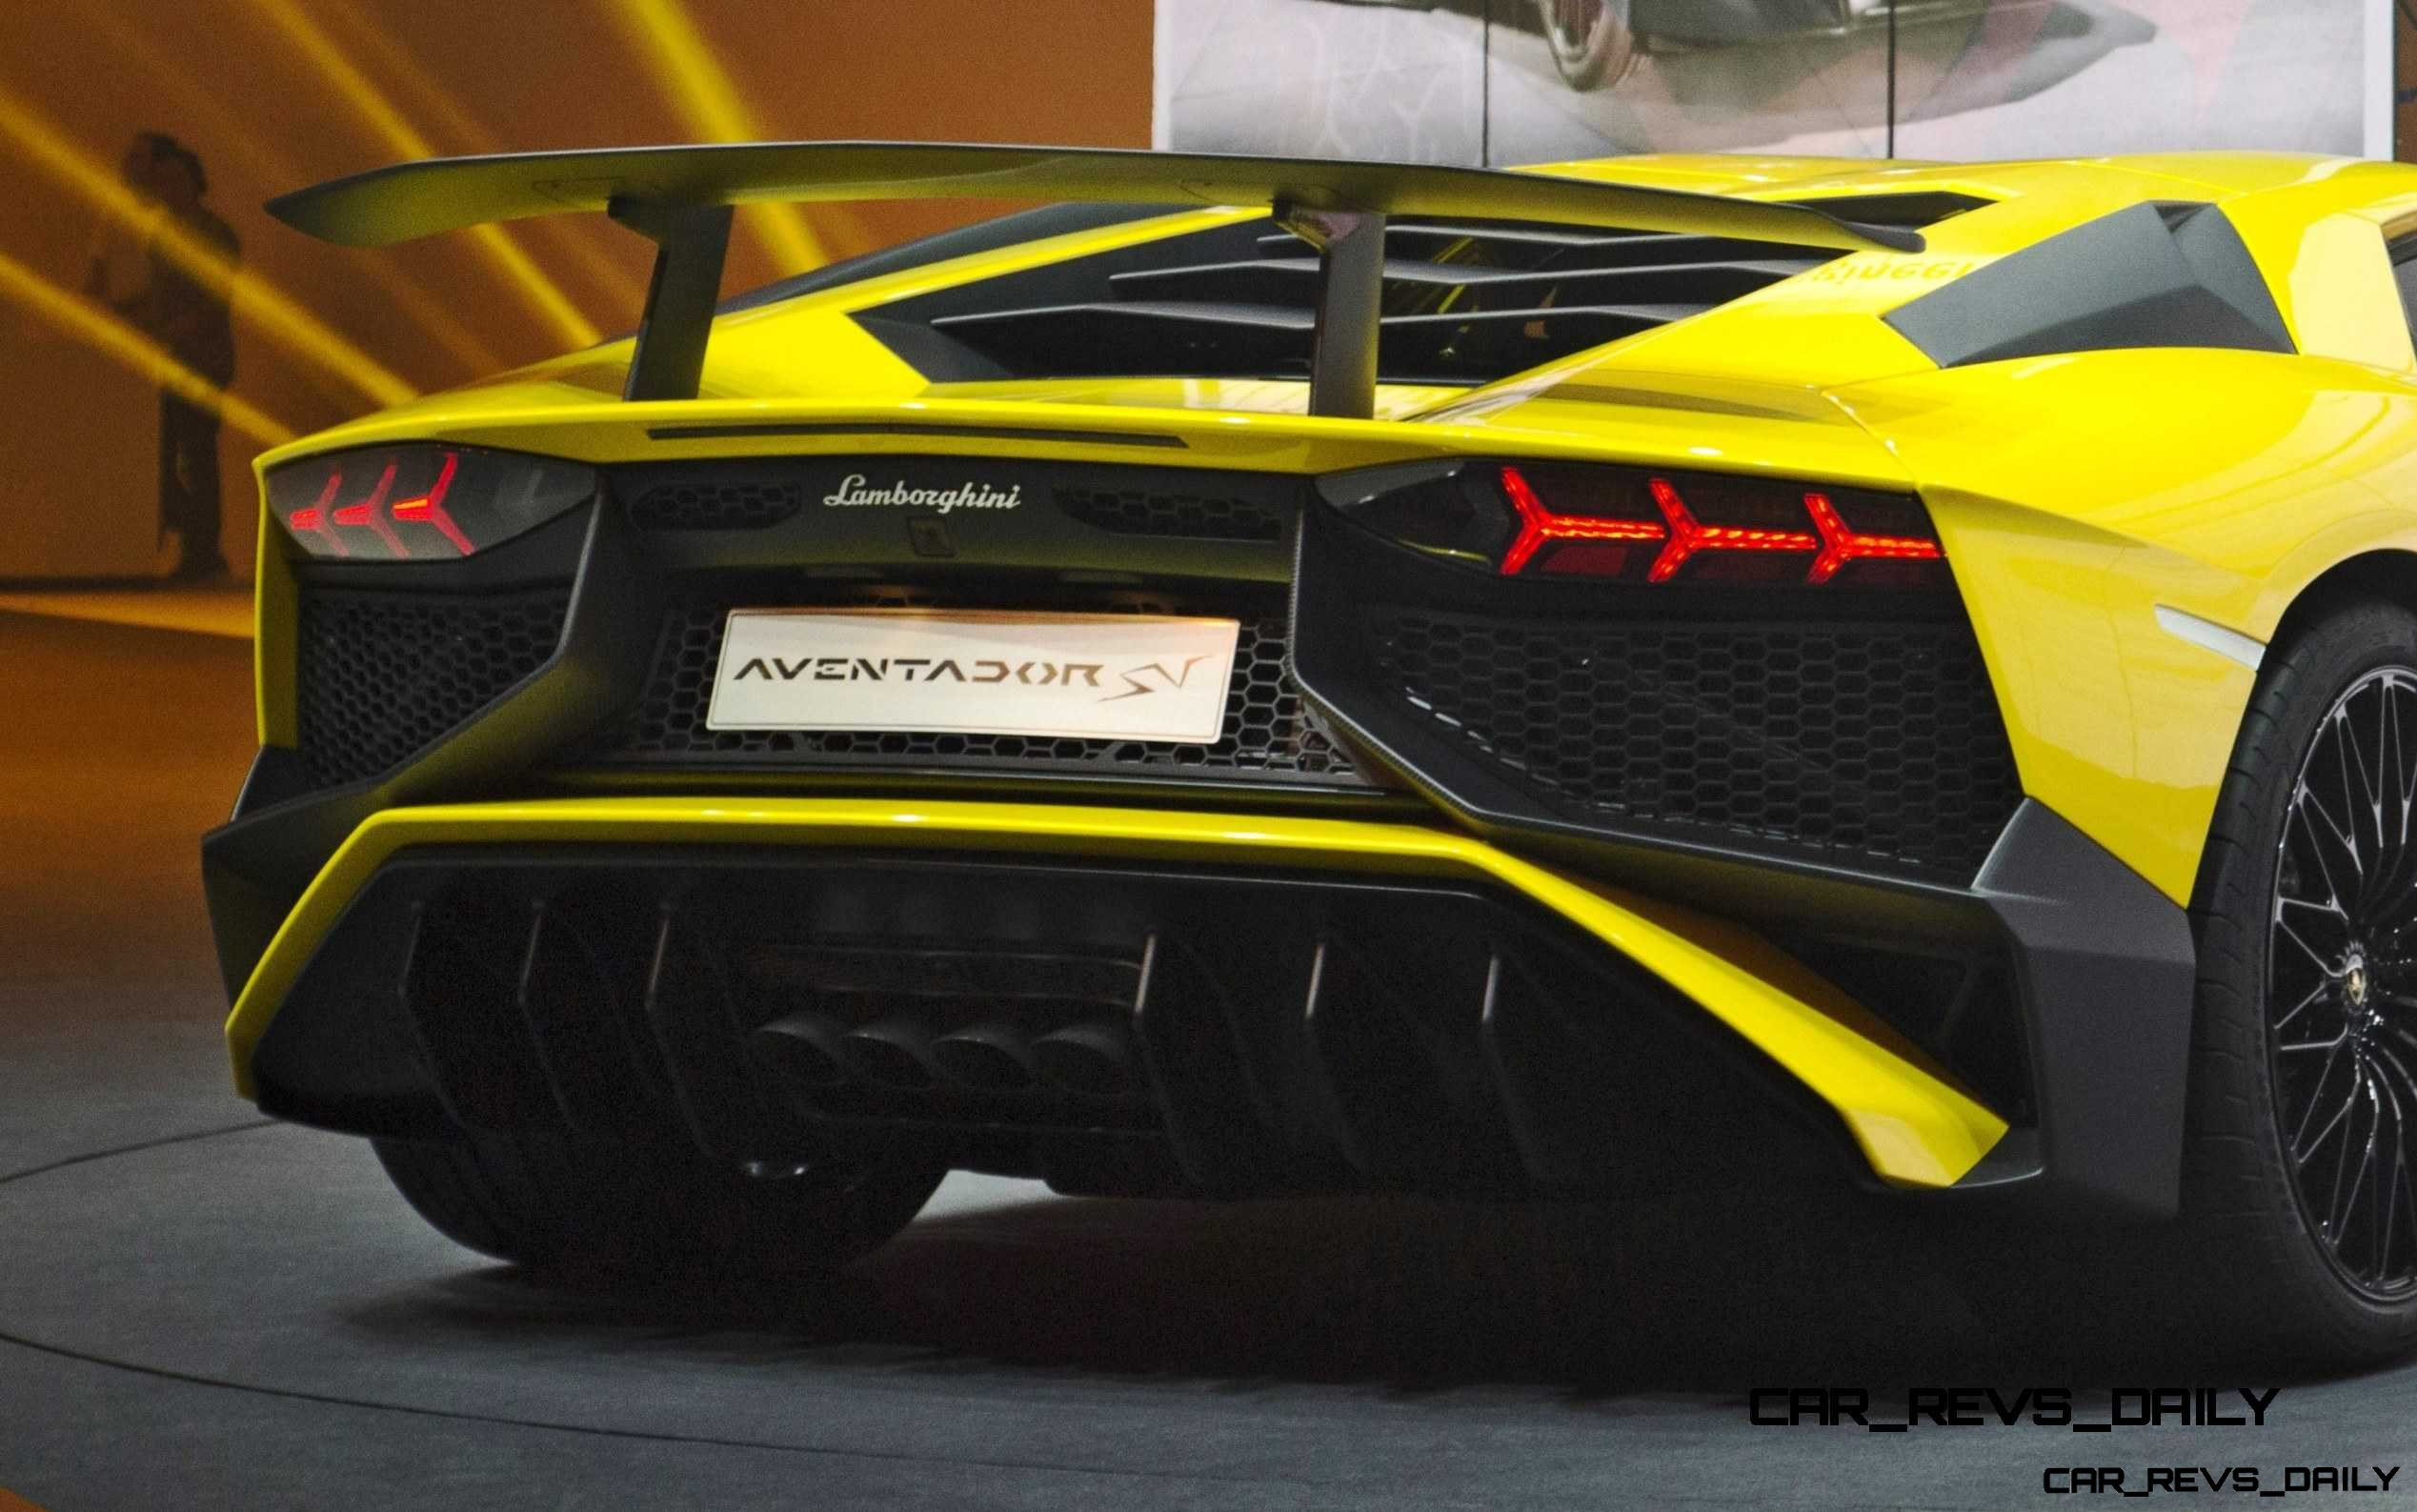 Geneva 2015 Galleries - The ITALIANS! Lamborghini, Ferrari, Maserati and Alfa Romeo 39